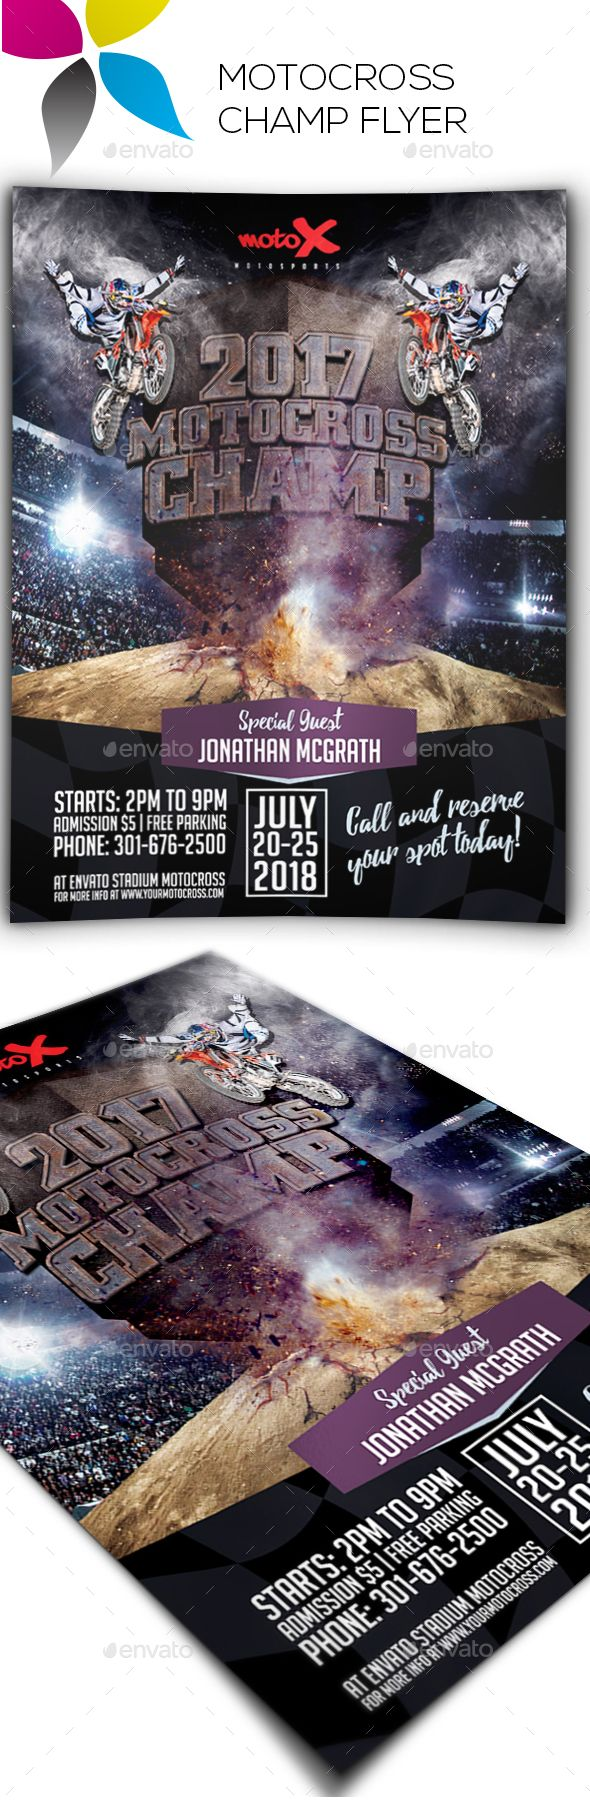 Motocross Champ Flyer — Photoshop PSD #motocross championship flyers #raceway • Available here → https://graphicriver.net/item/motocross-champ-flyer/17782109?ref=pxcr